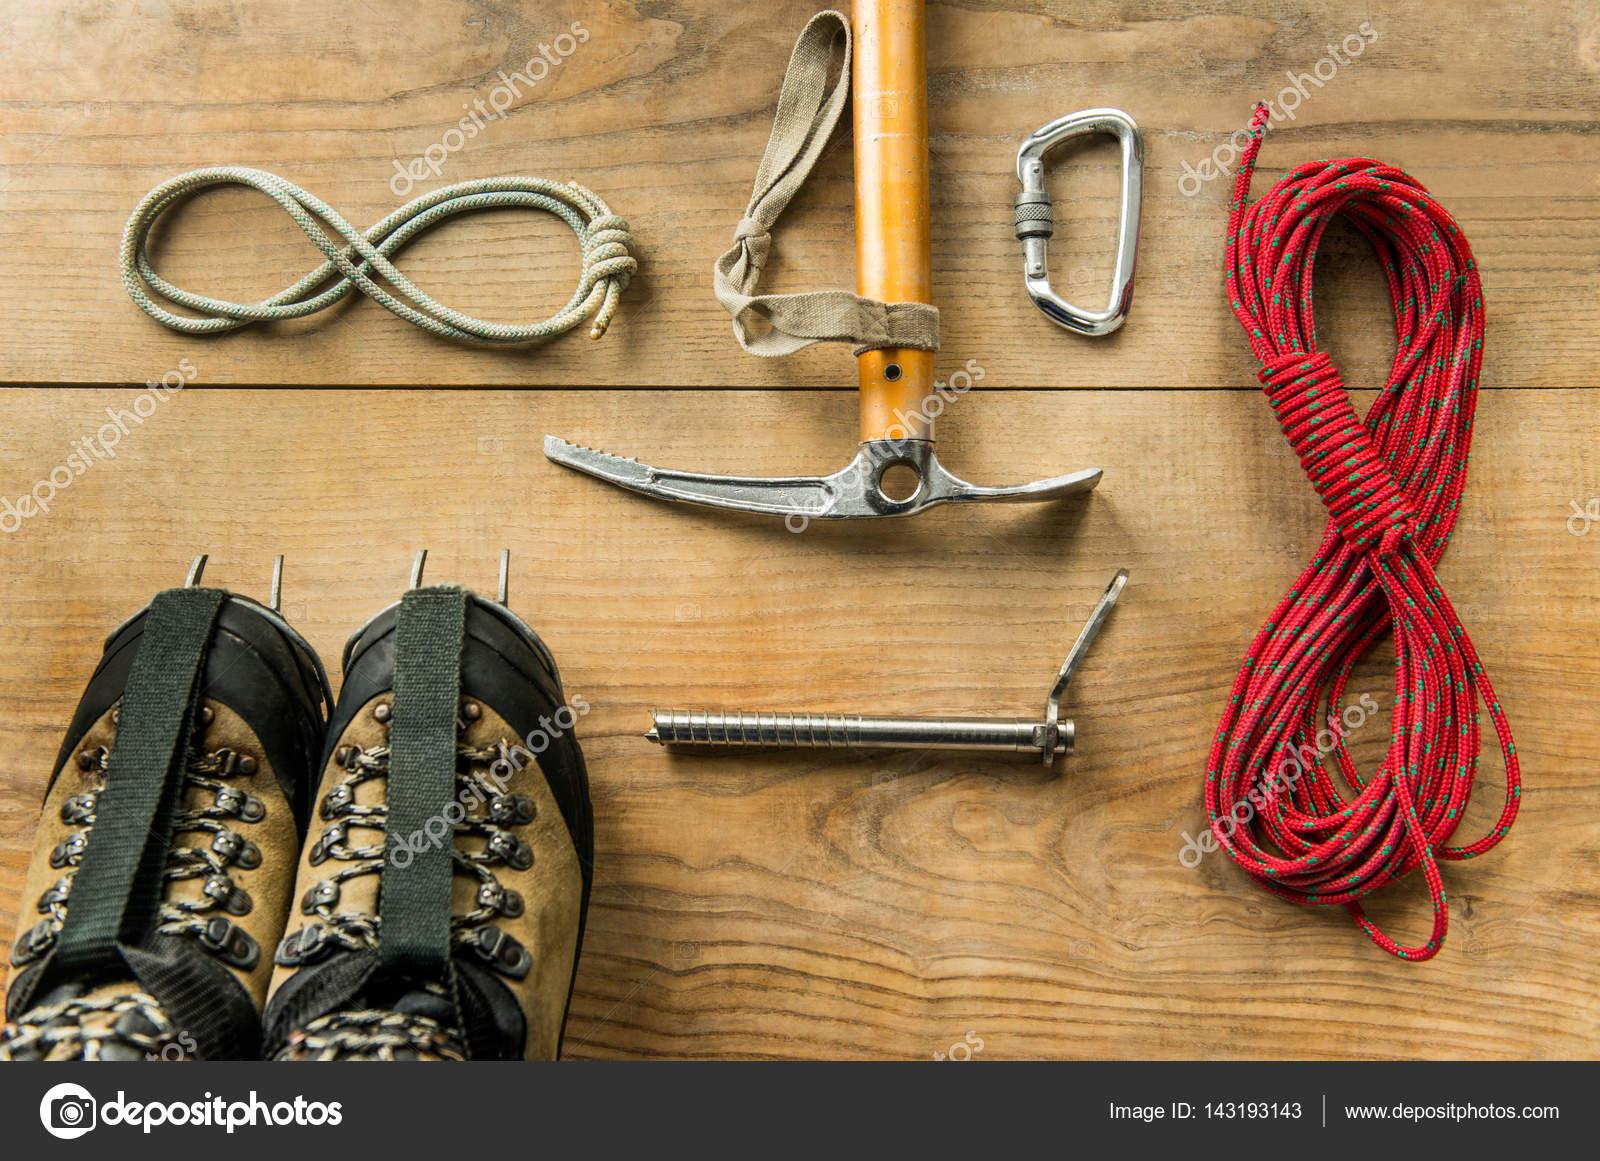 reputable site 77e88 d96be Attrezzatura: corda, scarpe da trekking, attrezzi da ...